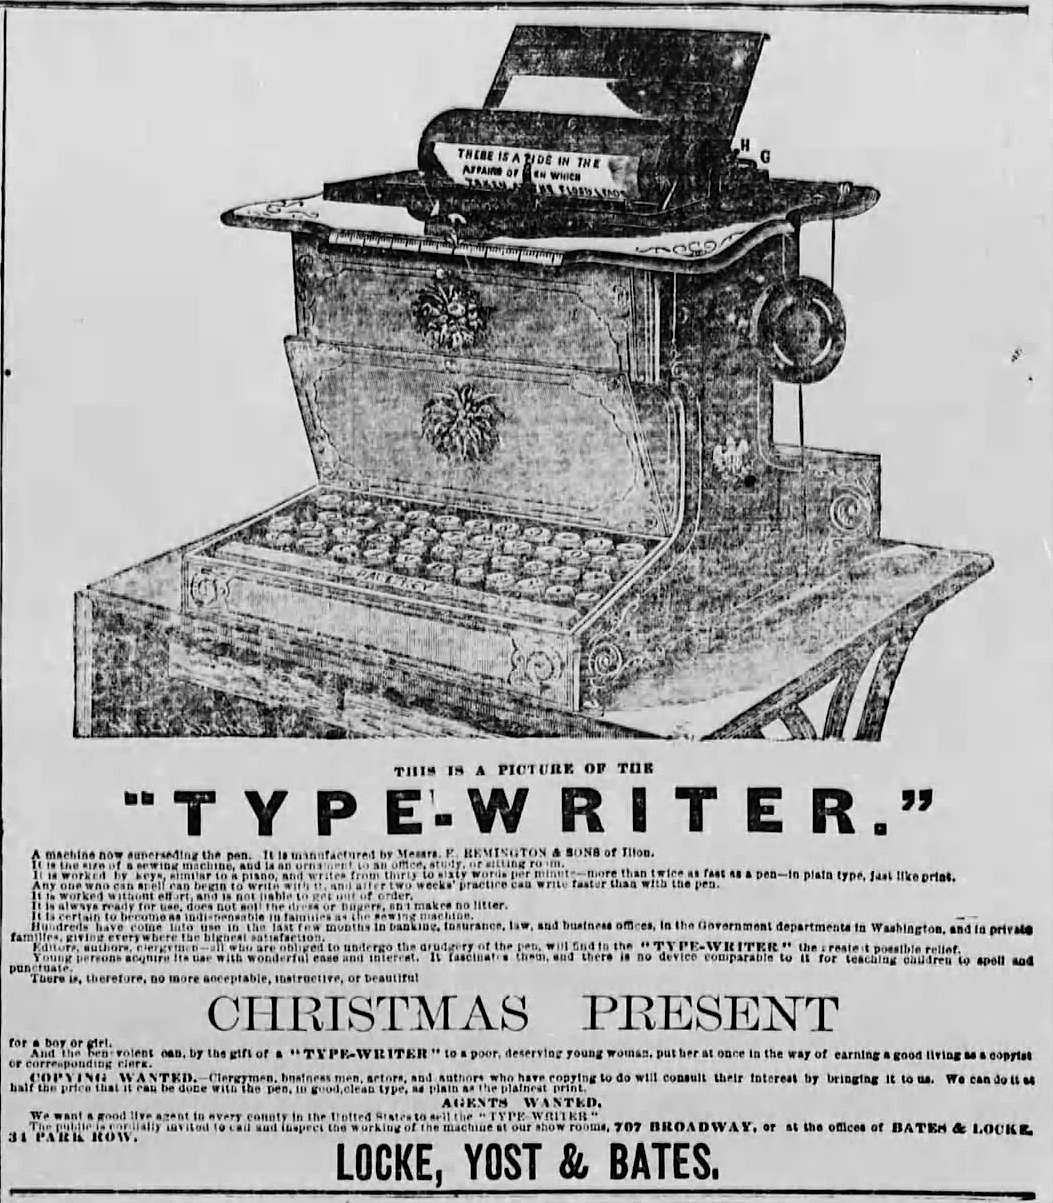 The Sun - New York, New York - Dec 16, 1875